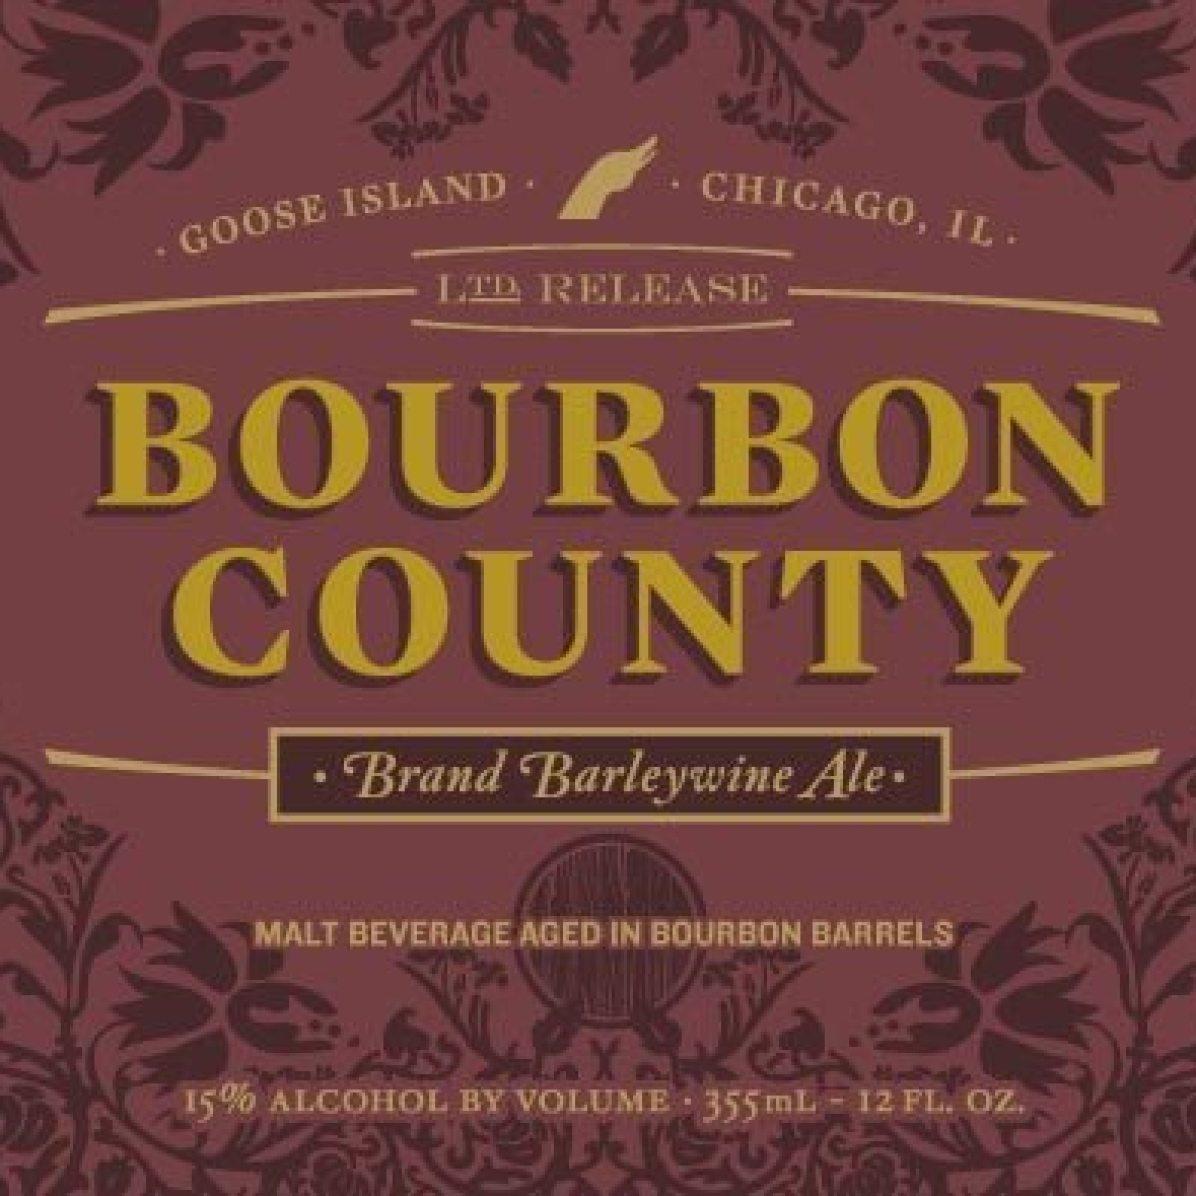 Goose Island Bourbon County Brand Barleywine (12 oz)